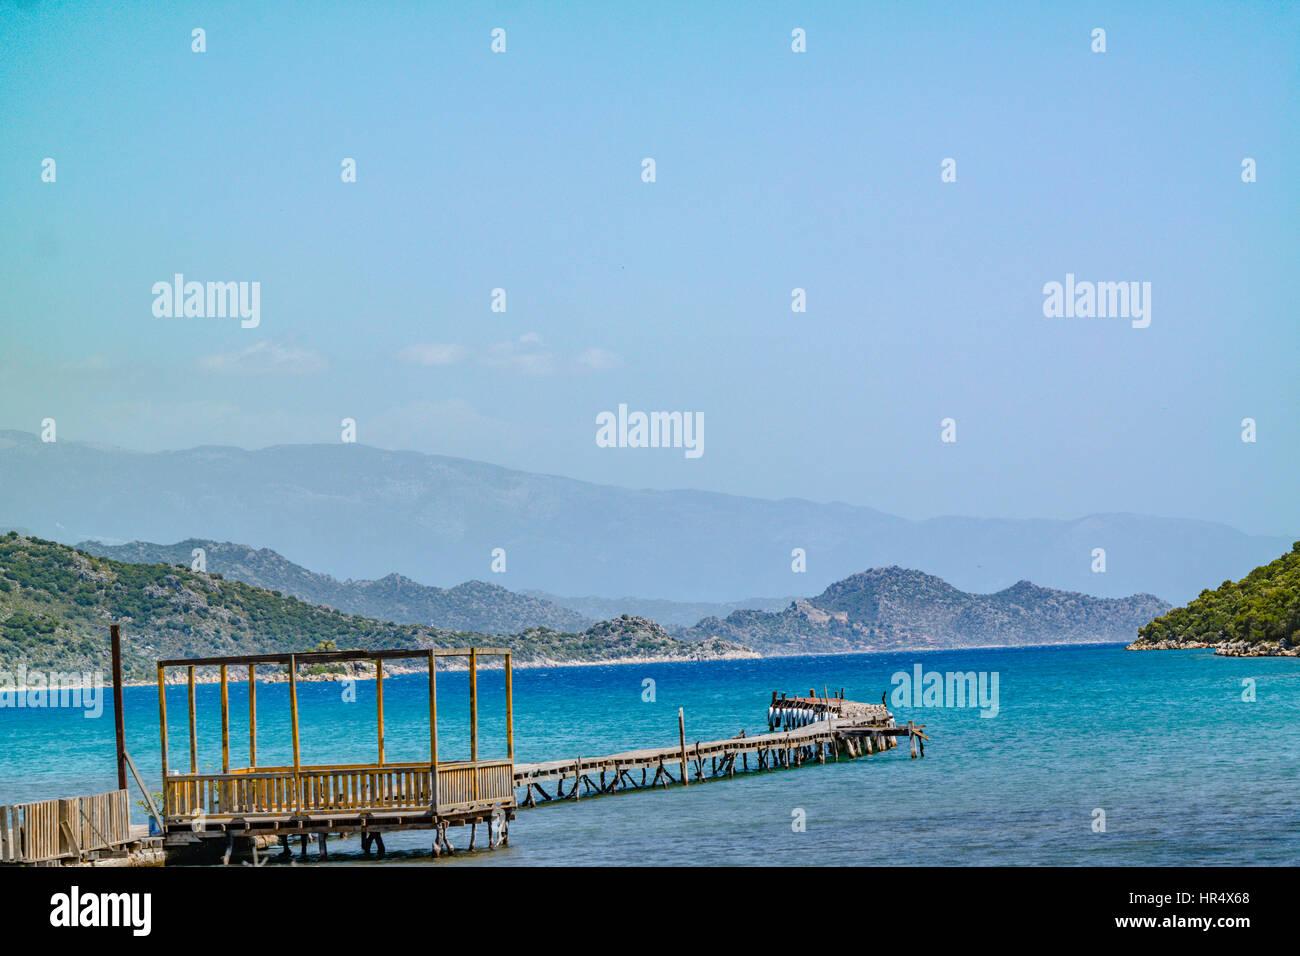 Long pier in to the sea in kekova gulf mediterranean turkey coastline. kekova korfezi denizde uzun iskele deniz - Stock Image